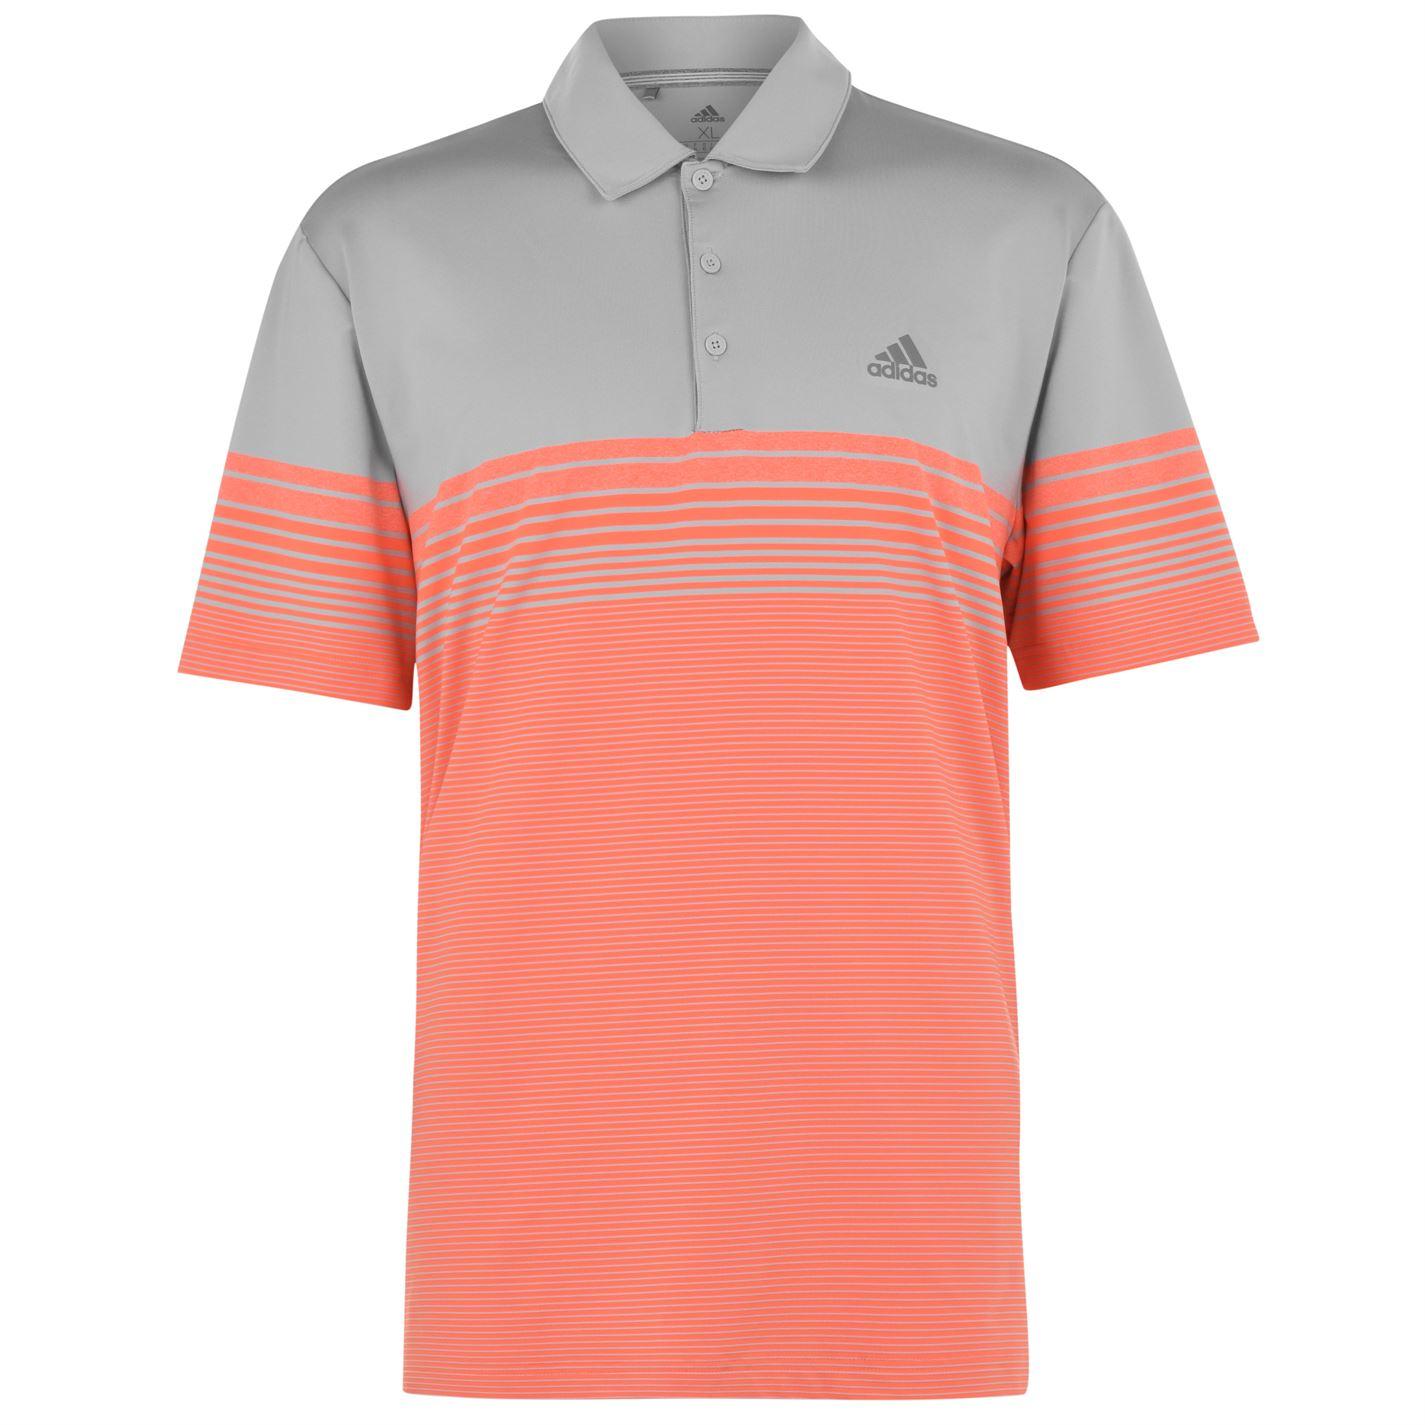 Adidas Ultimate Gradient Stripe